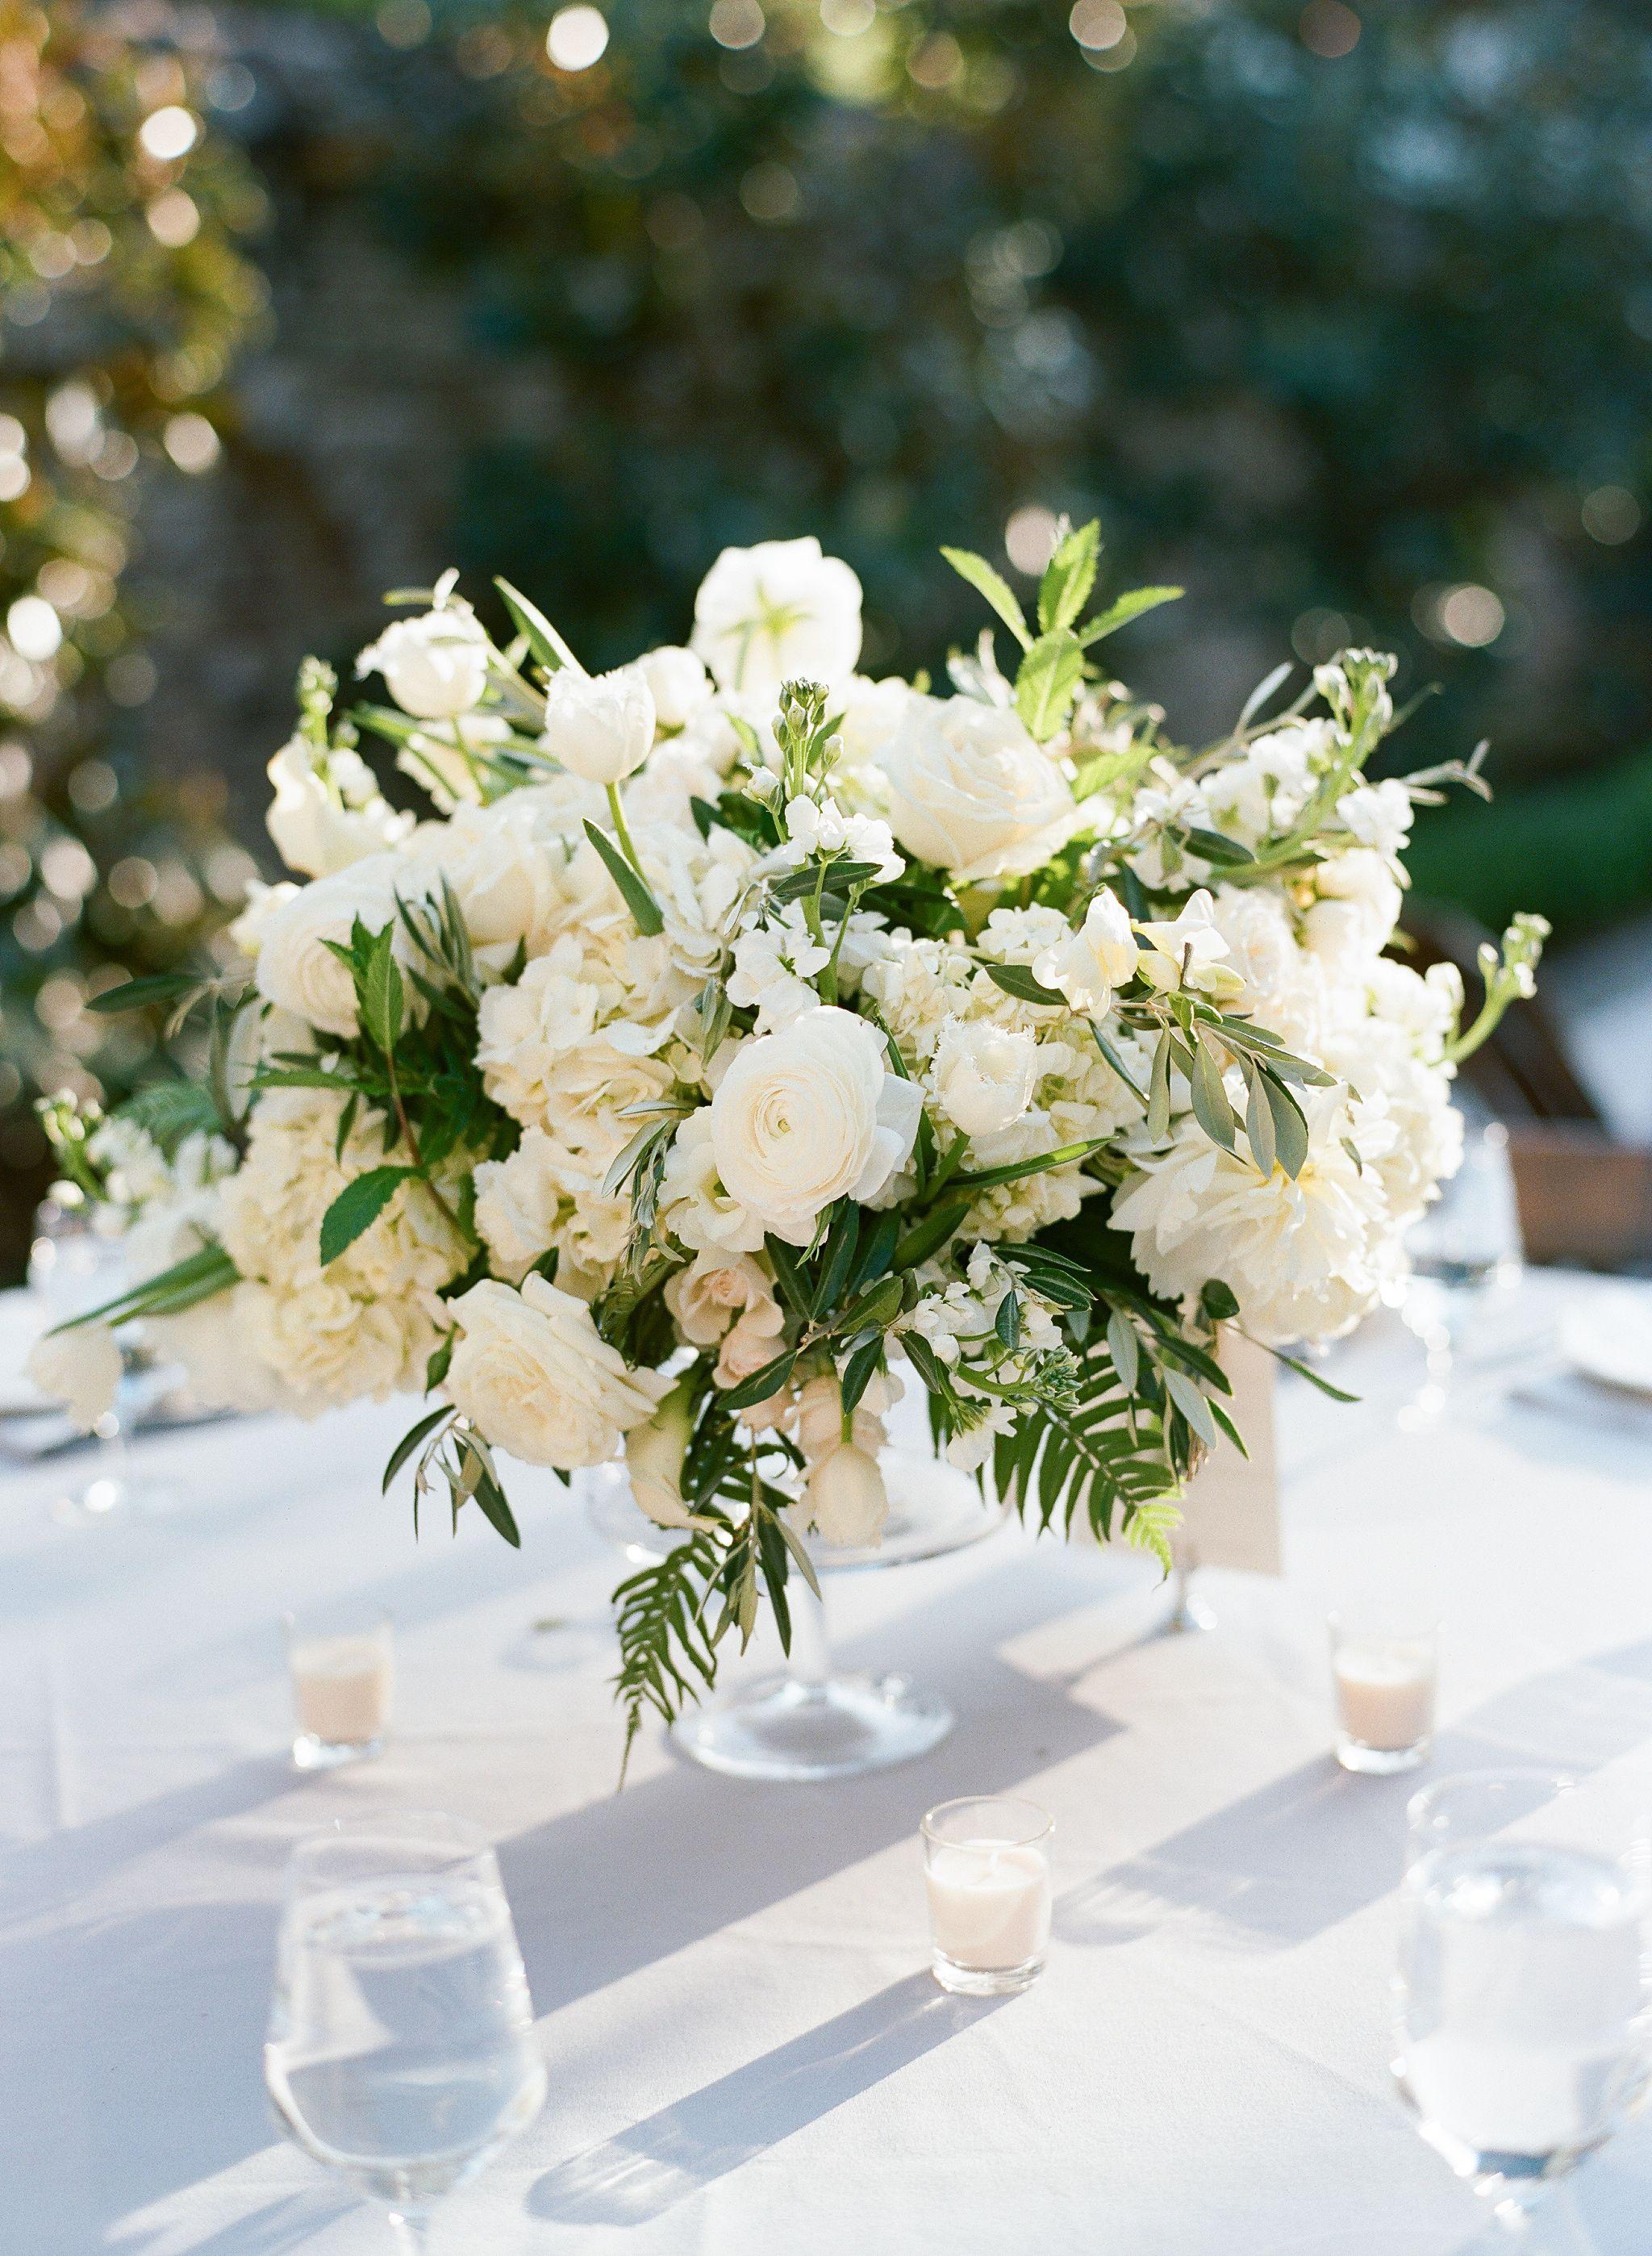 Garden Inspired White And Green Centerpieces Wedding Floral Centerpieces Wedding Centerpieces Flower Centerpieces Wedding